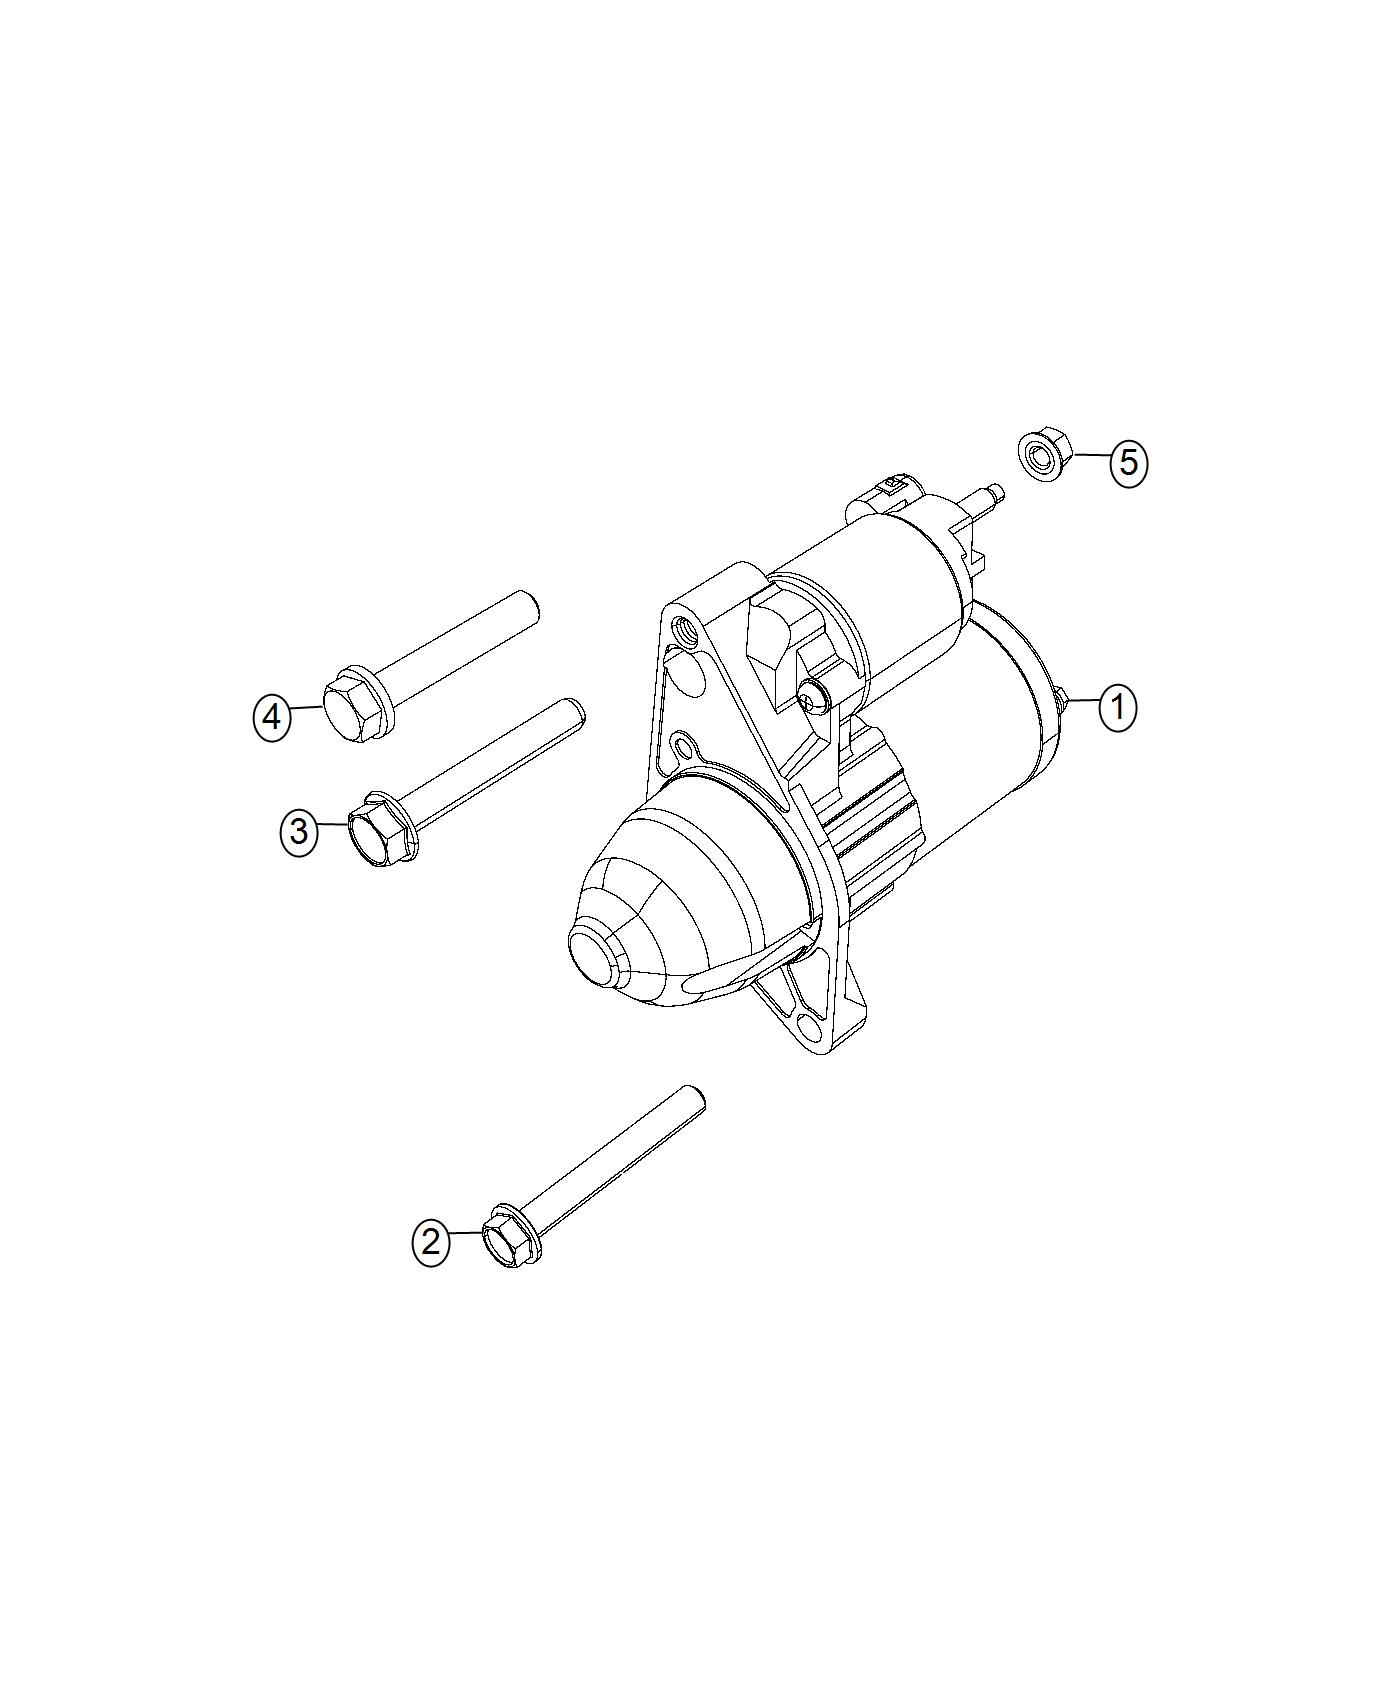 Jeep Compass Starter Engine Power Train Parts